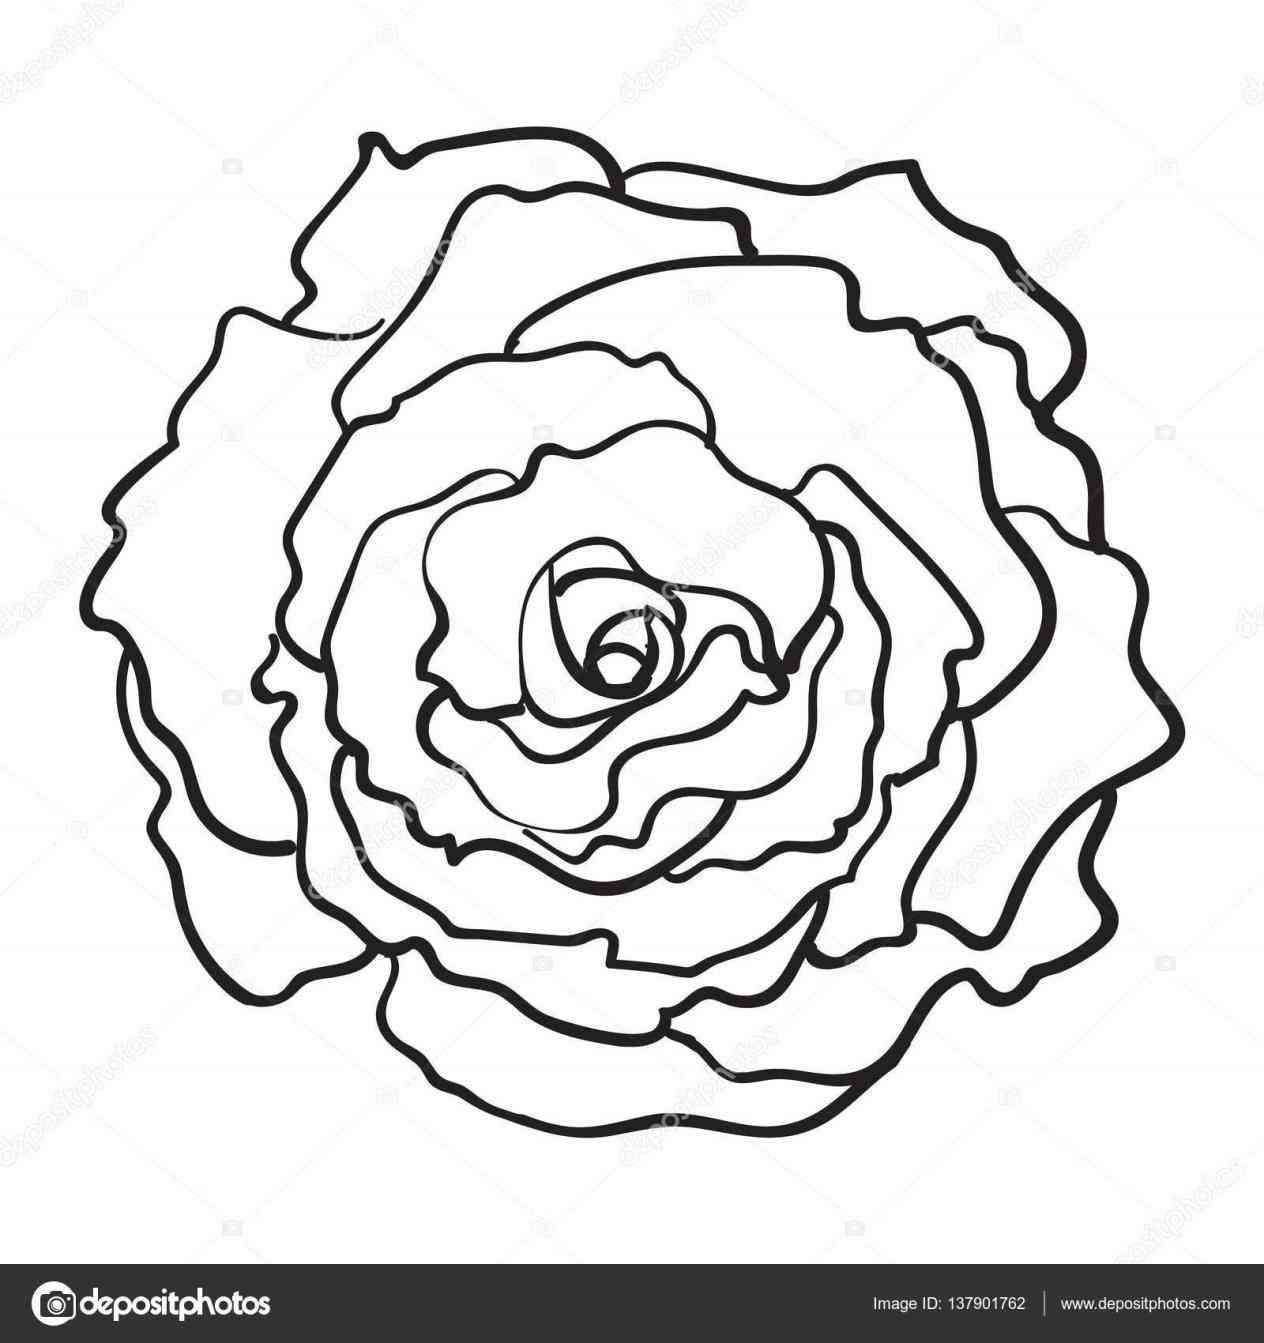 1264x1343 Drawings Ideas Best Open Rose Line Drawing Pencil